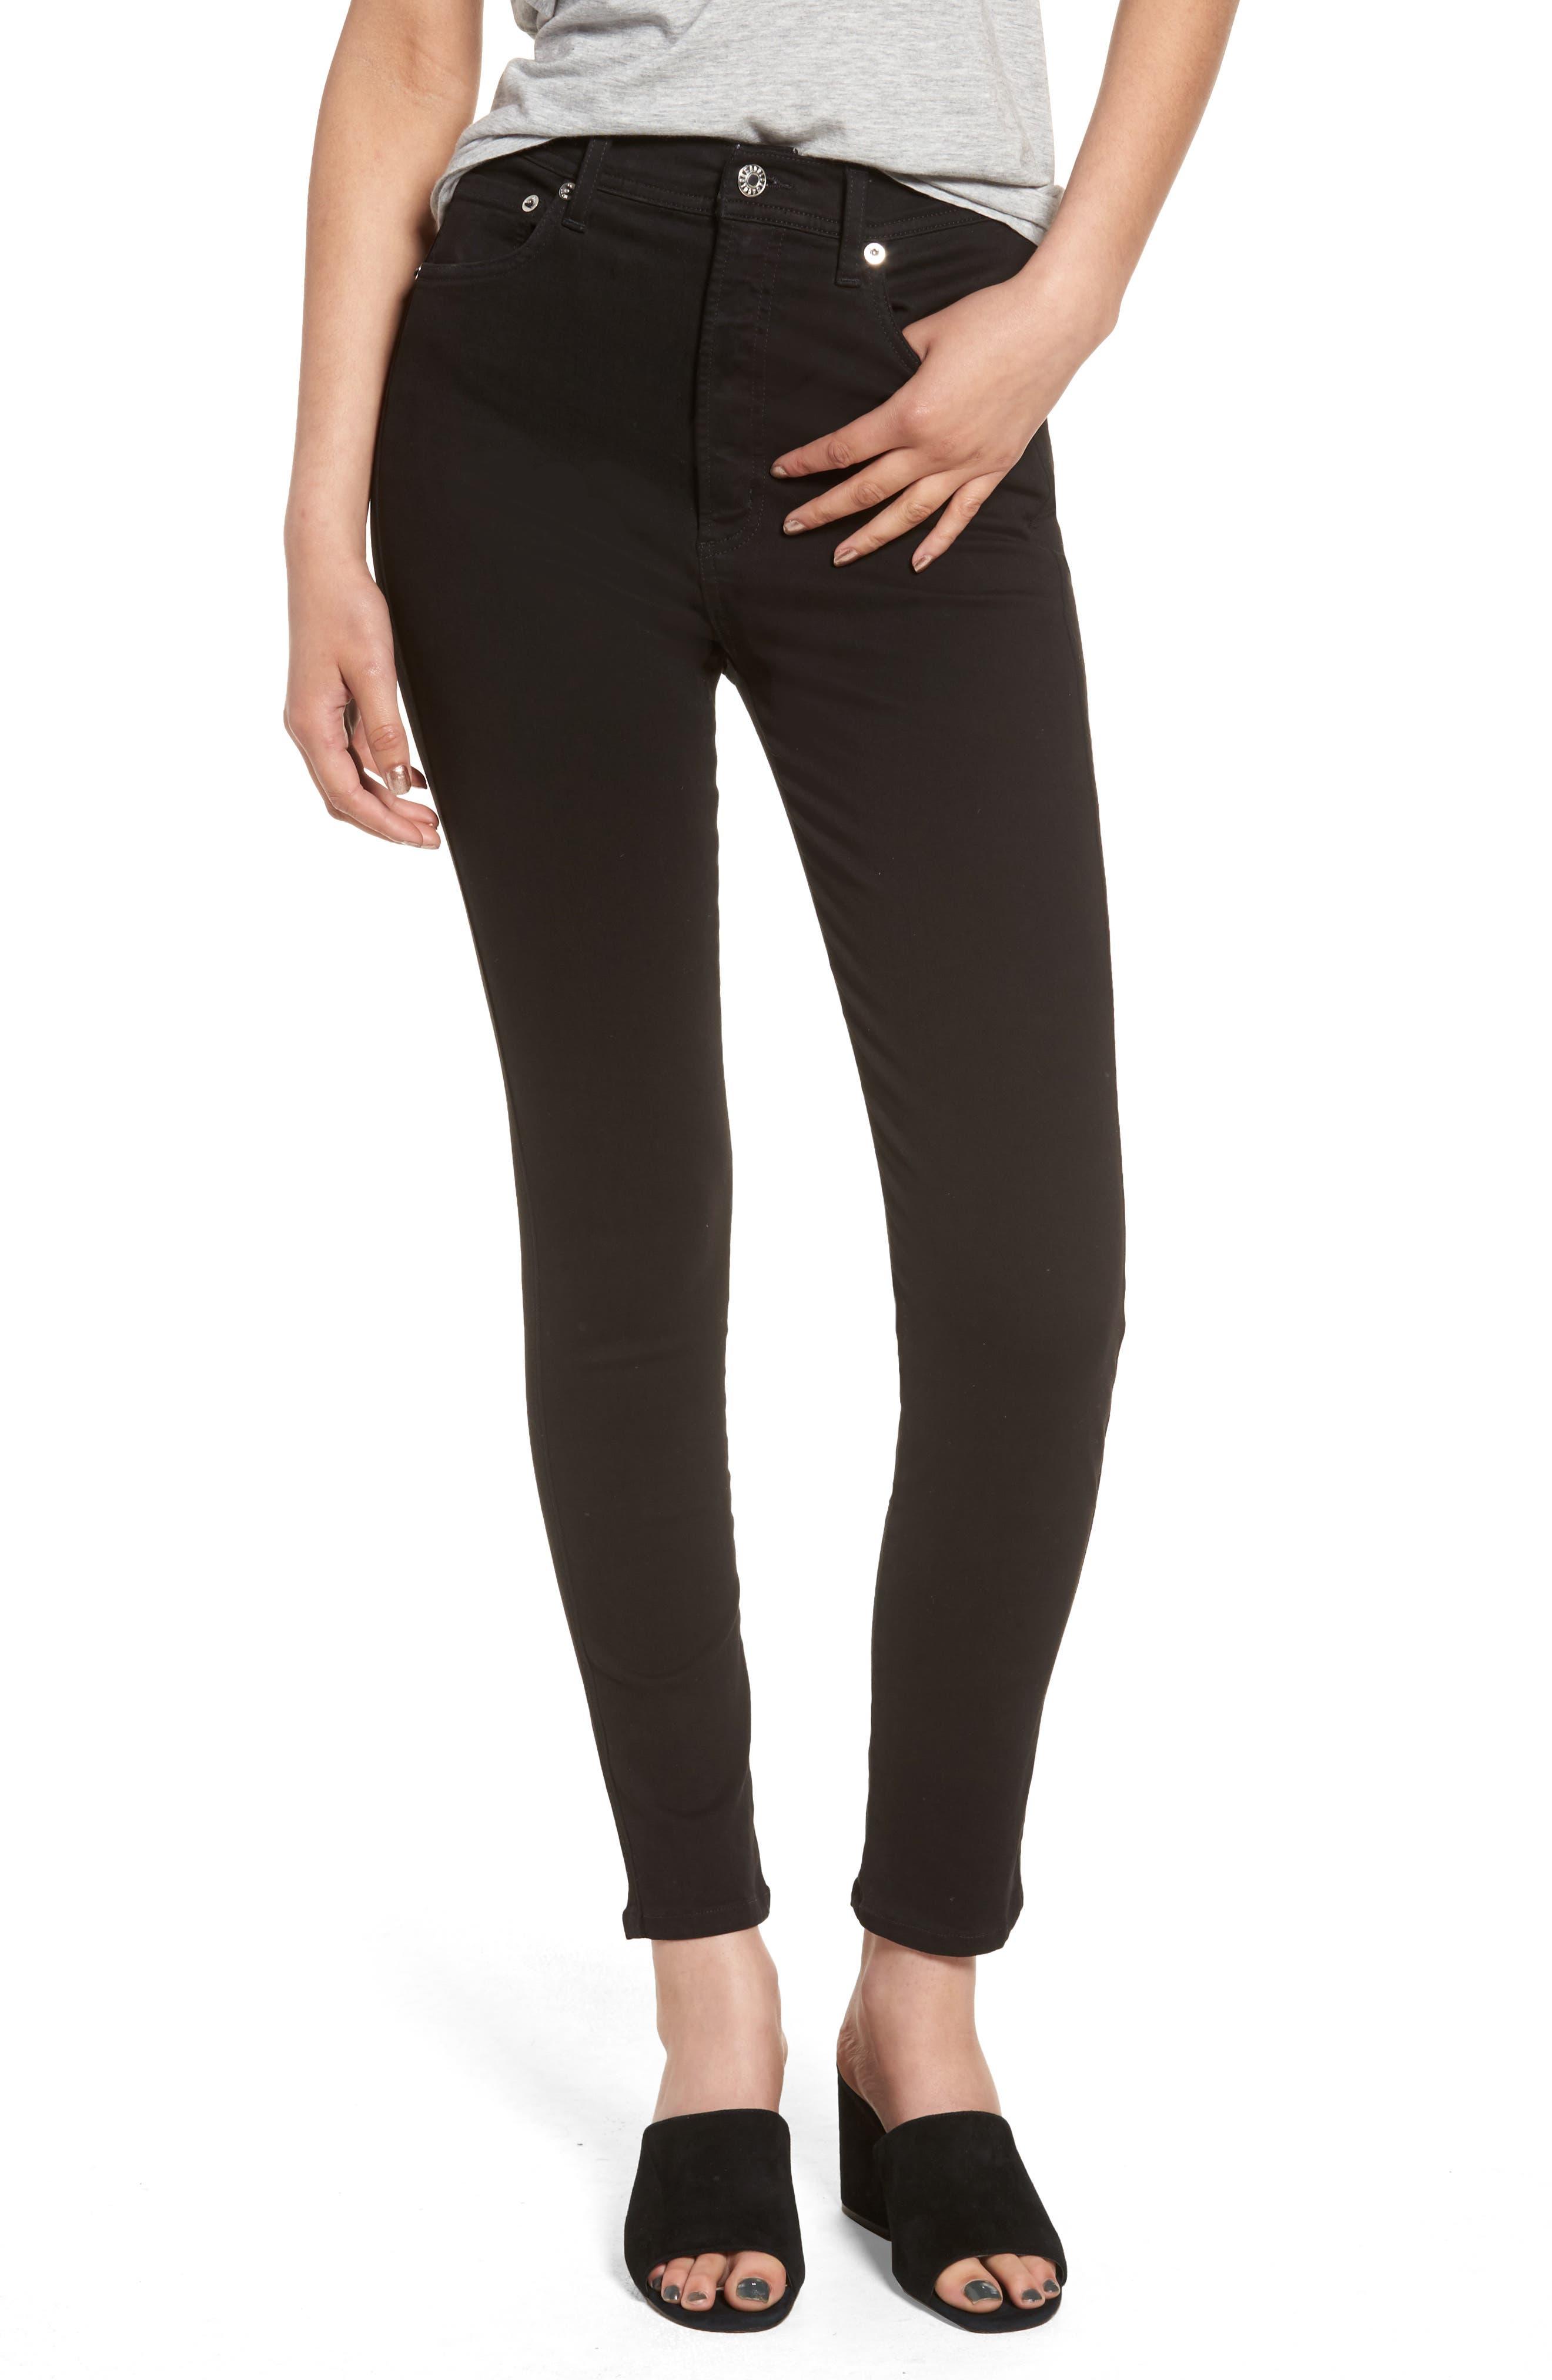 Main Image - AGOLDE Roxanne Super High Rise Skinny Jeans (Jet)